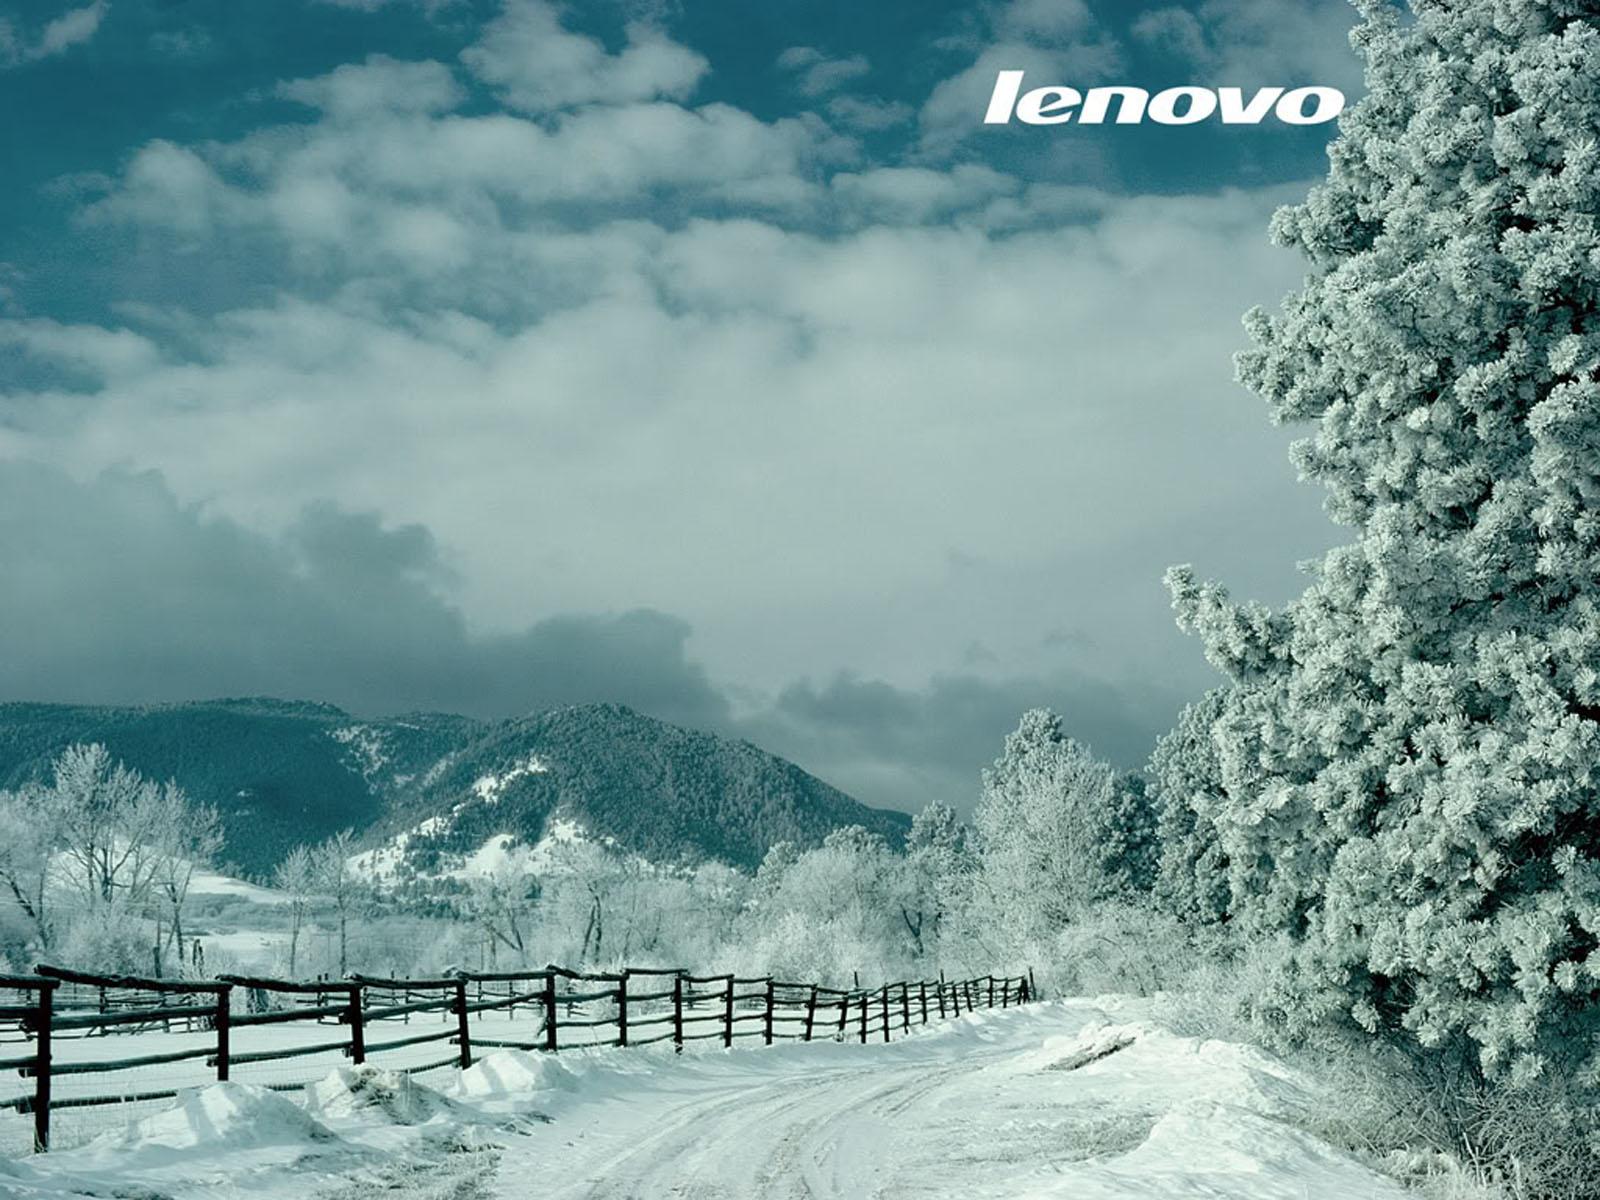 wallpapers Lenovo Laptop Wallpapers 1600x1200